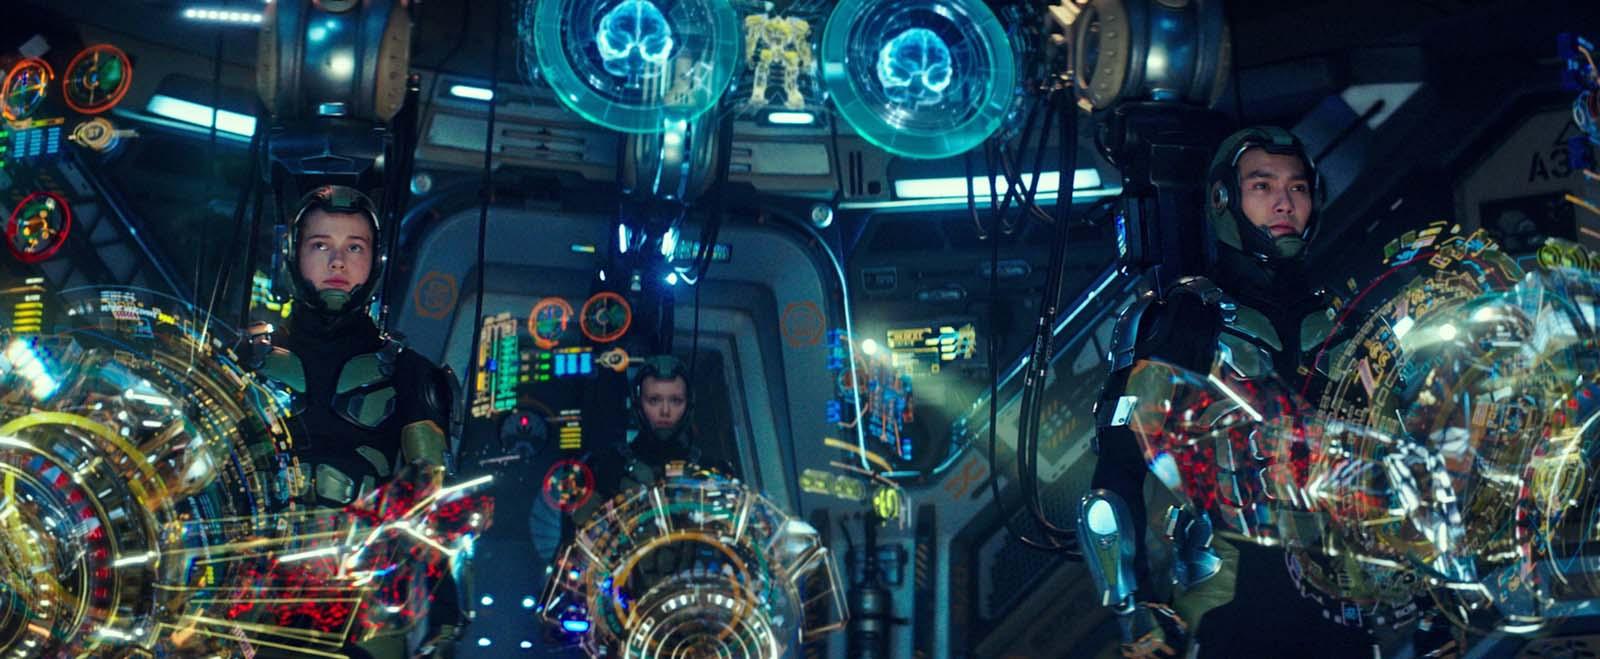 Pasific Rim 2 Film Konusu Film Önerileri 2018